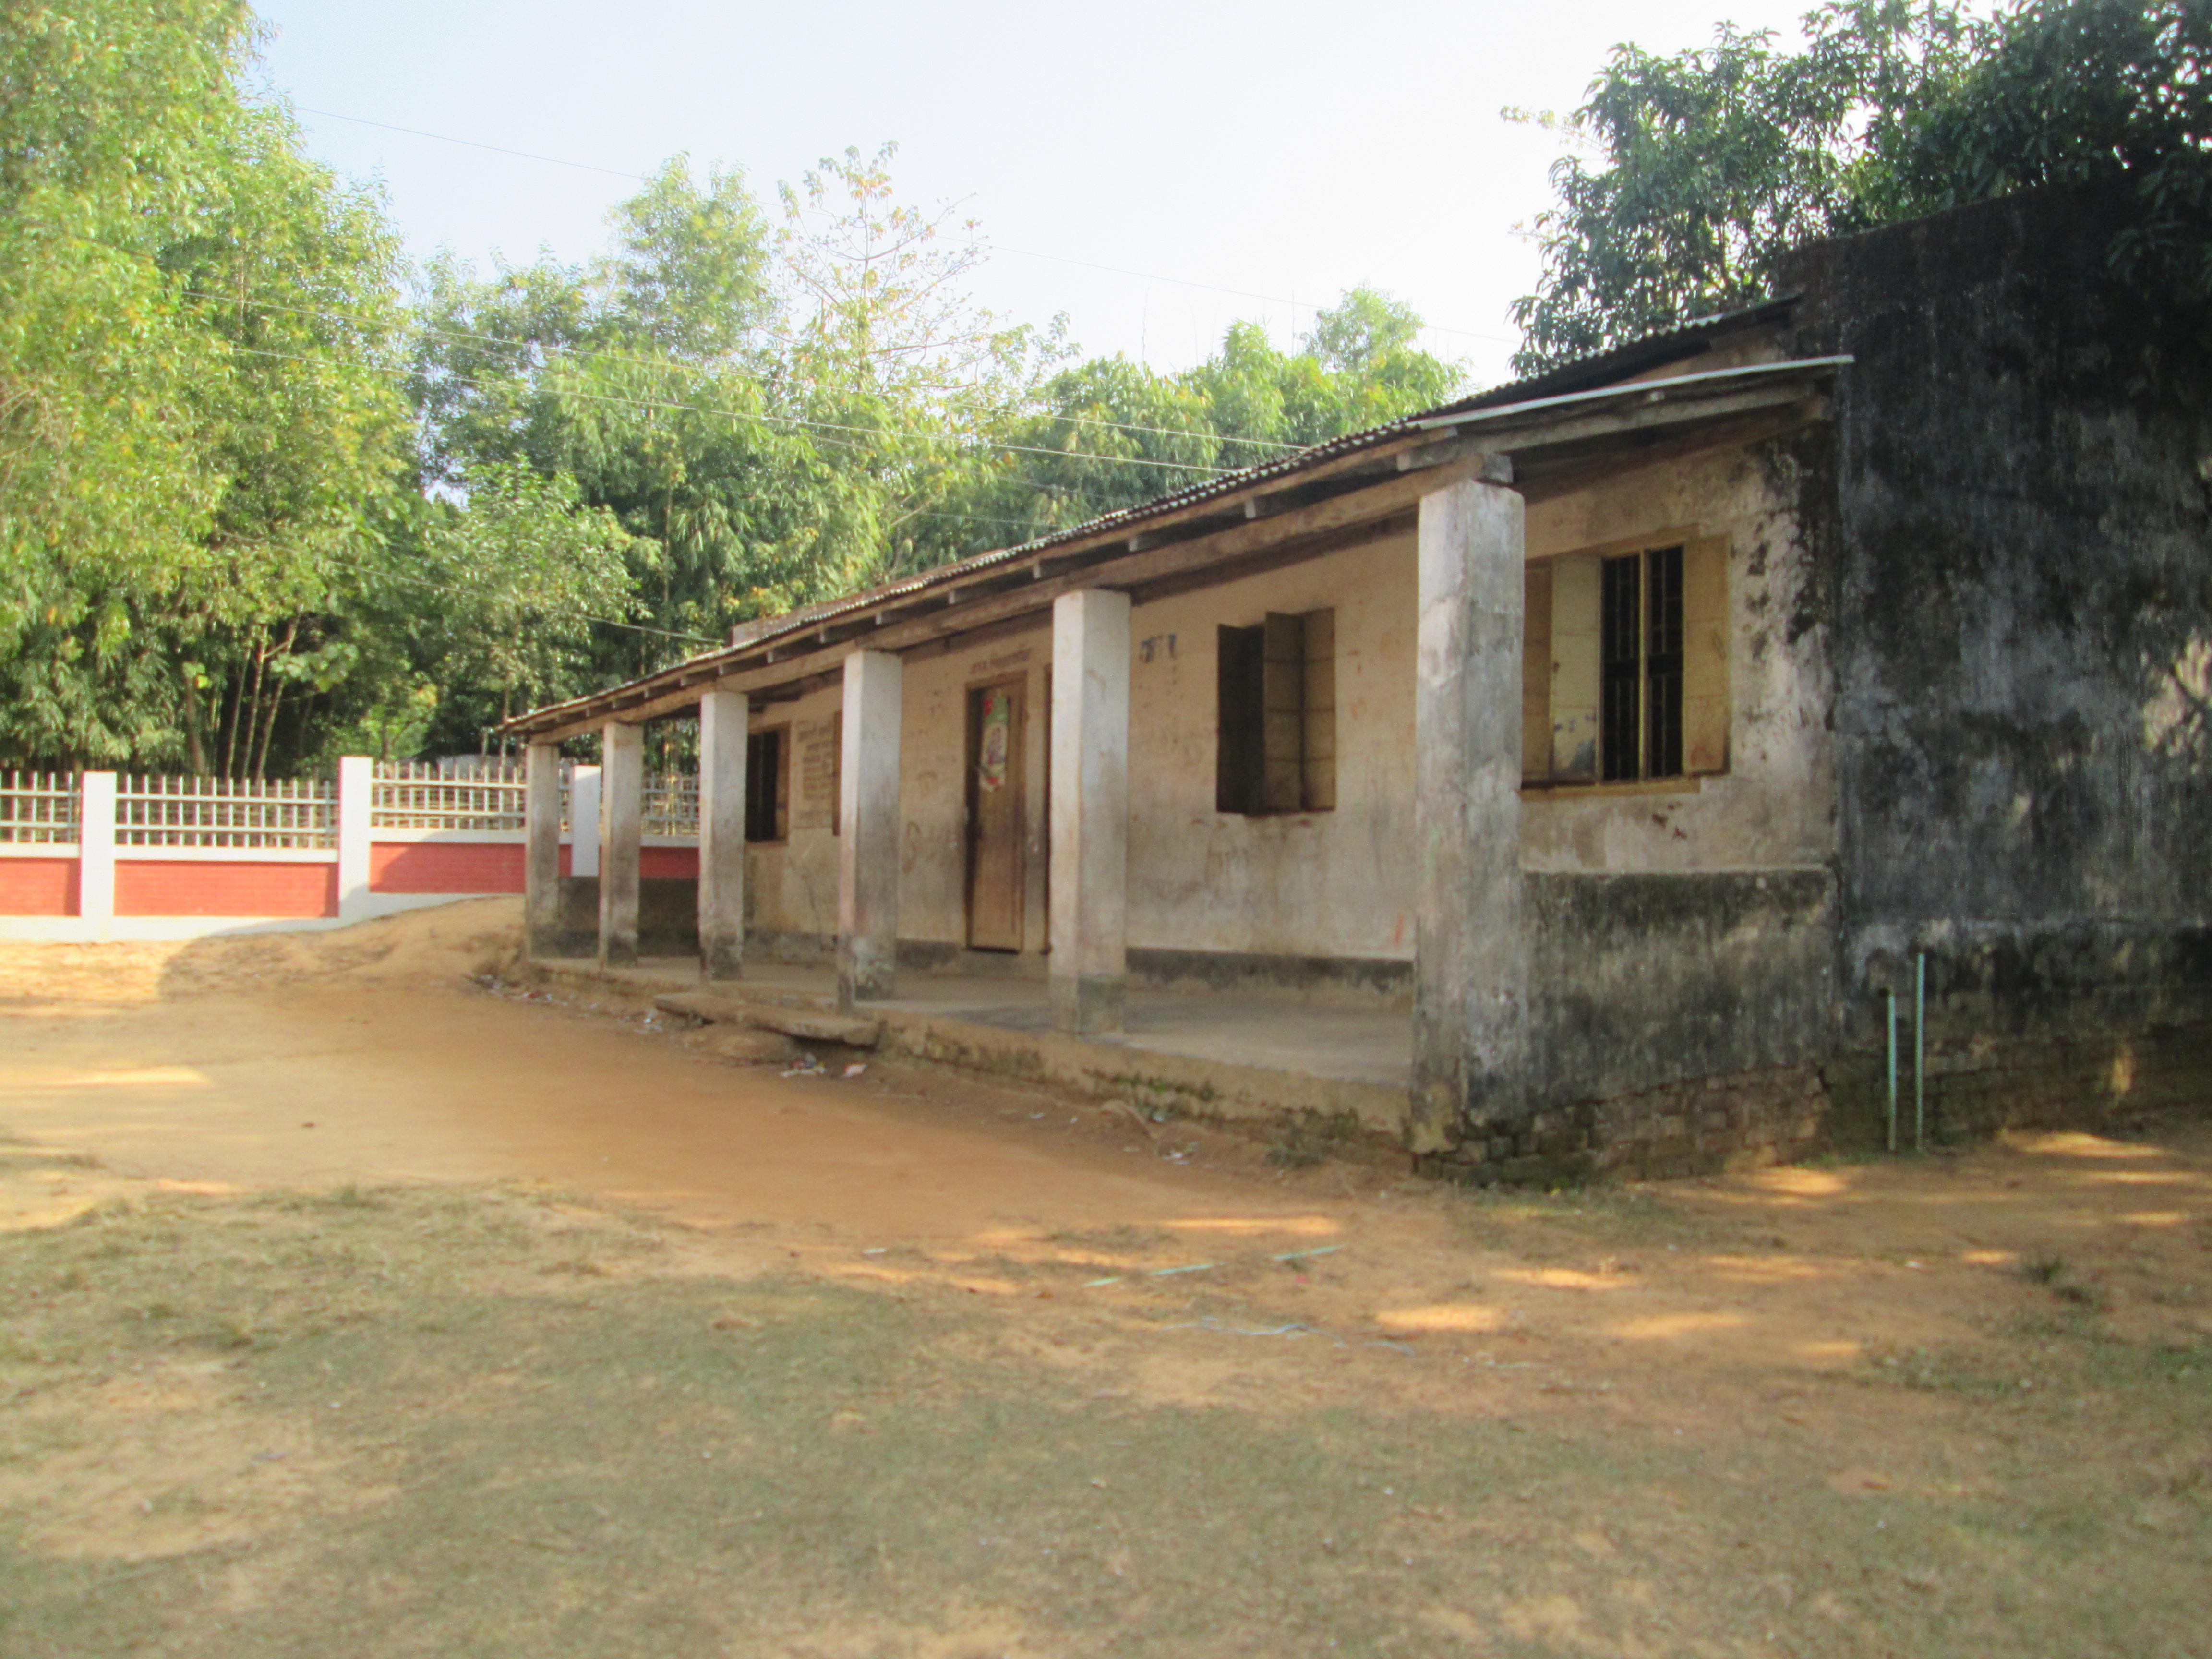 Existing location of school cum disaster shelter building in Amtoli